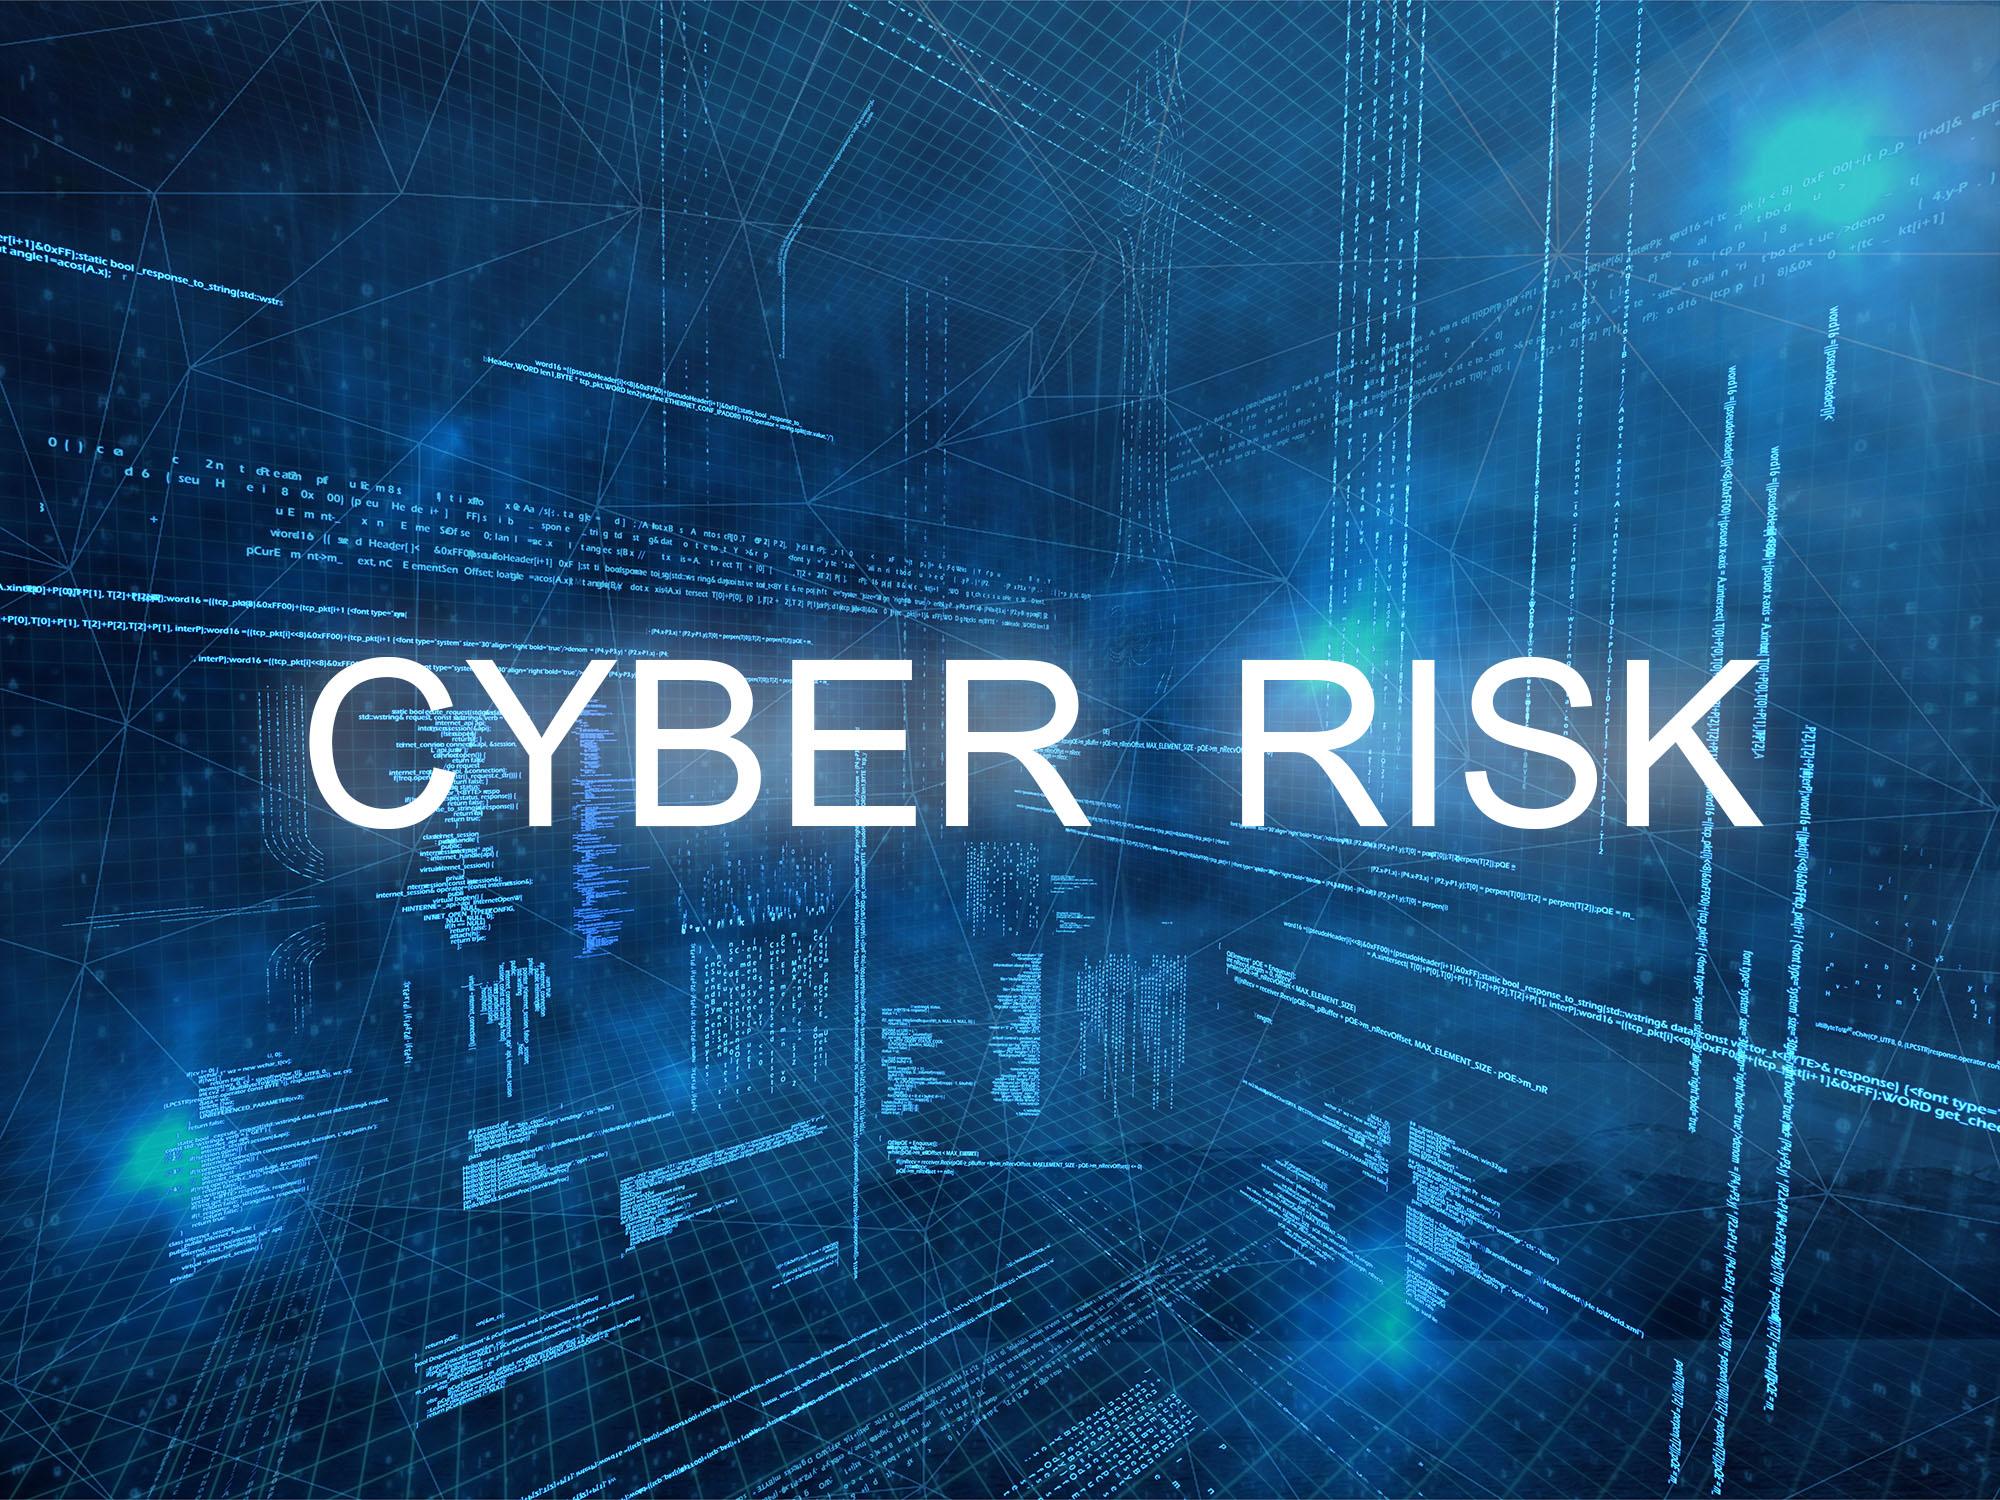 CYBER-RISK-custom-general.jpg